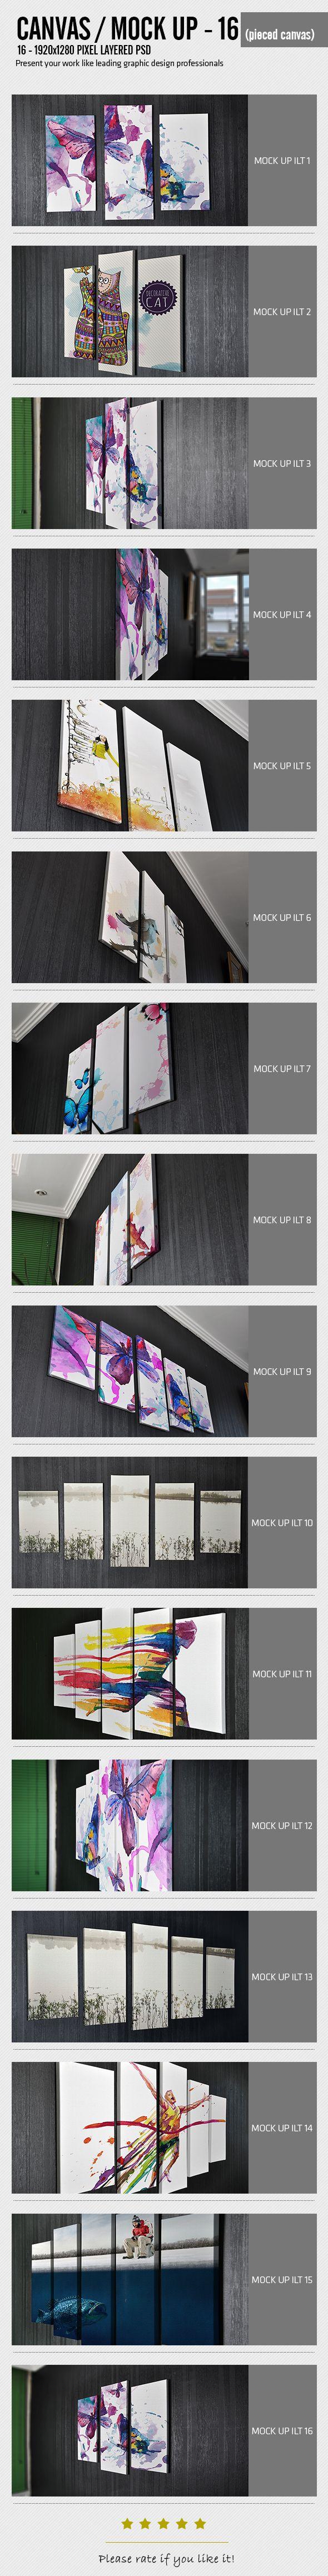 Canvas Mock up (piecad canvas)  canvas, elegant, gallery, gallery wrap, mock up, mock-up, mock-up template, mockup, modern, photo, photo-realistic, piece canvas, present, presentation, realism, realistic, render, showcase, template, three-dimensional, vertical canvas